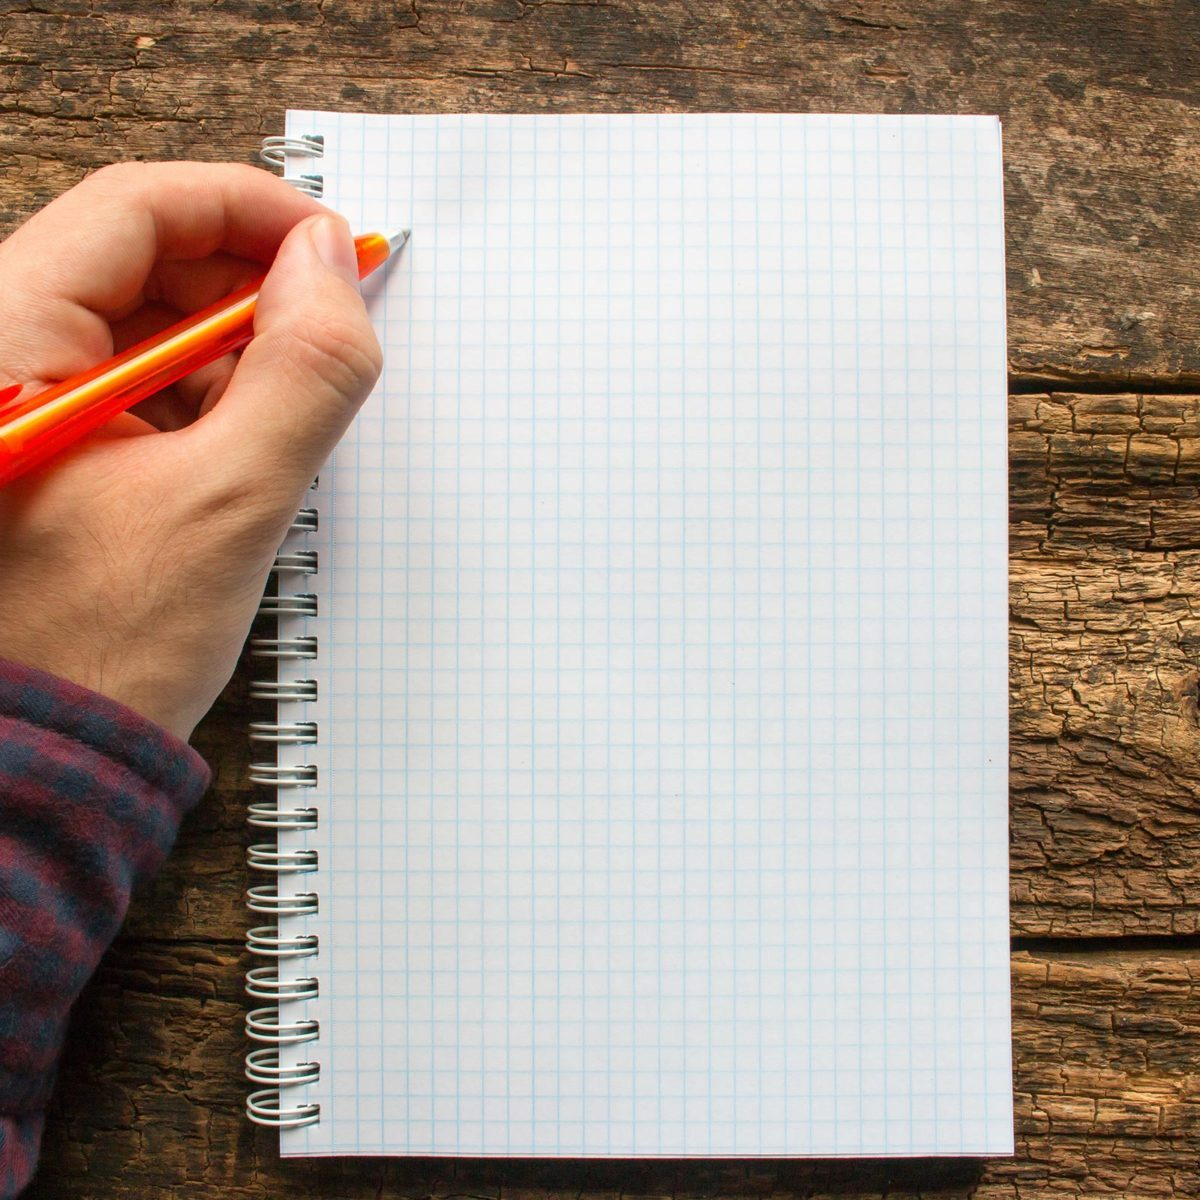 15 Surprising Benefits of Being Left-Handed